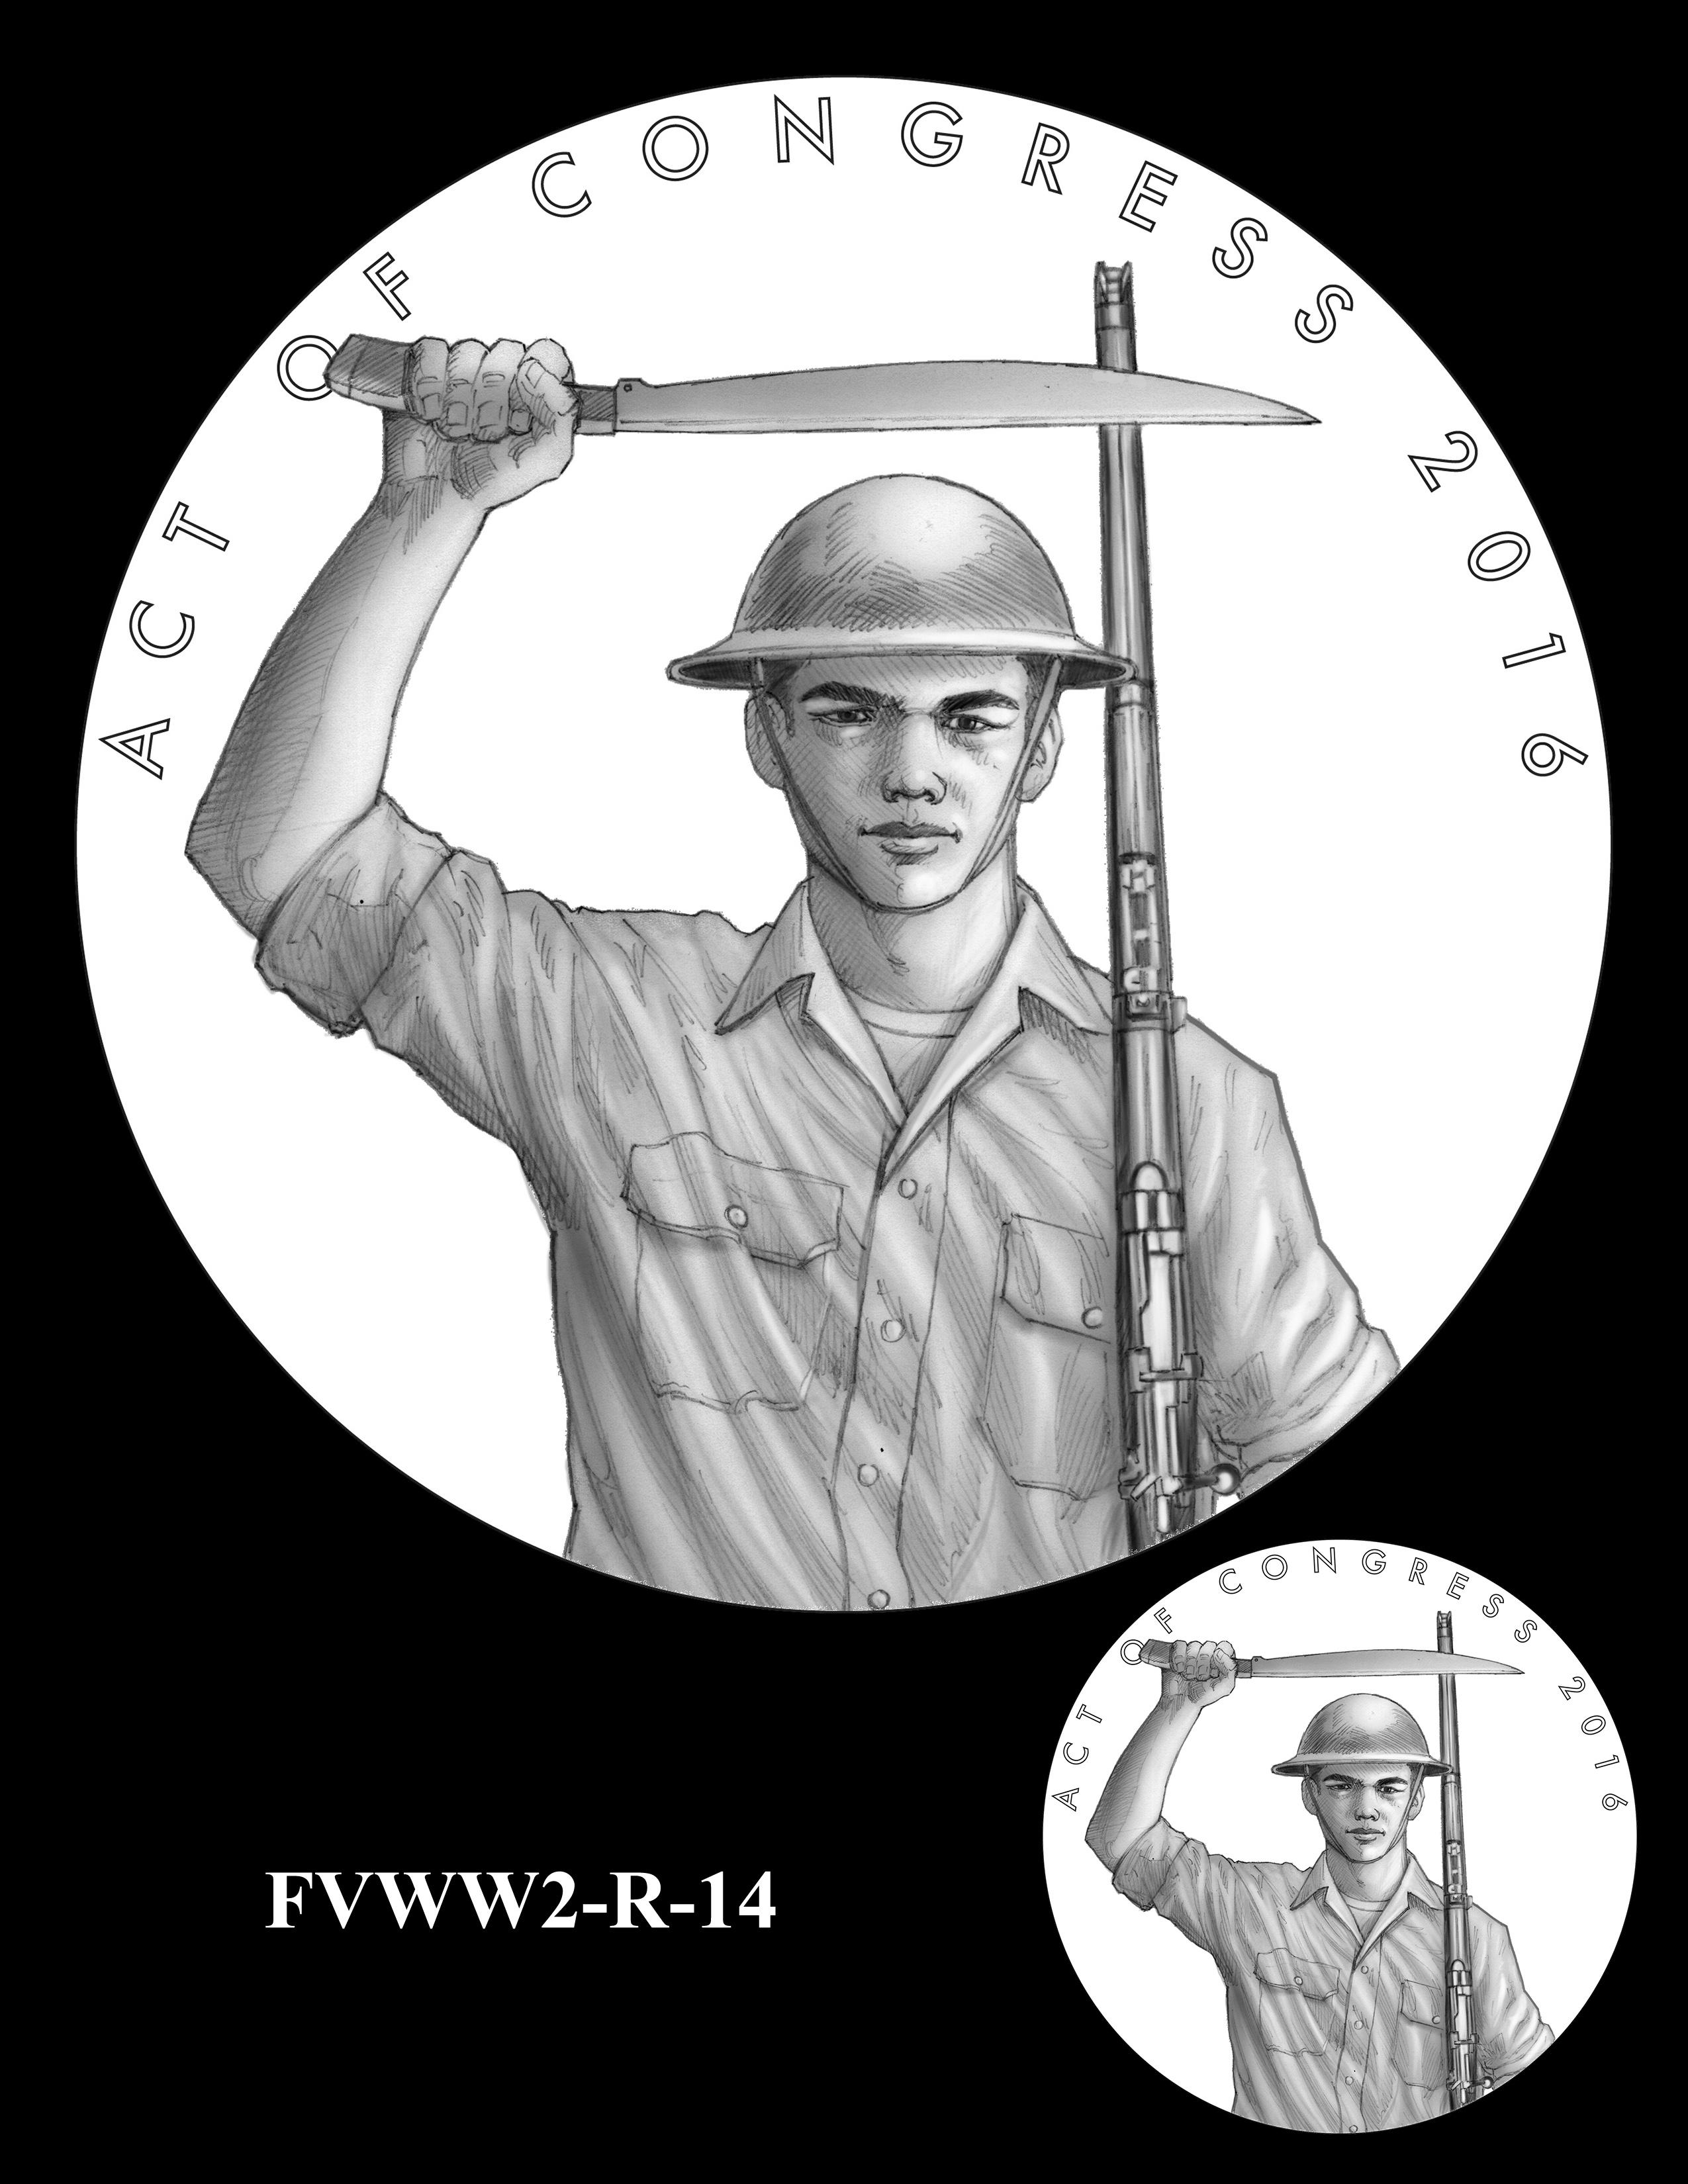 FVWW2-R-14 -- Filipino Veterans of World War II Congressional Gold Medal